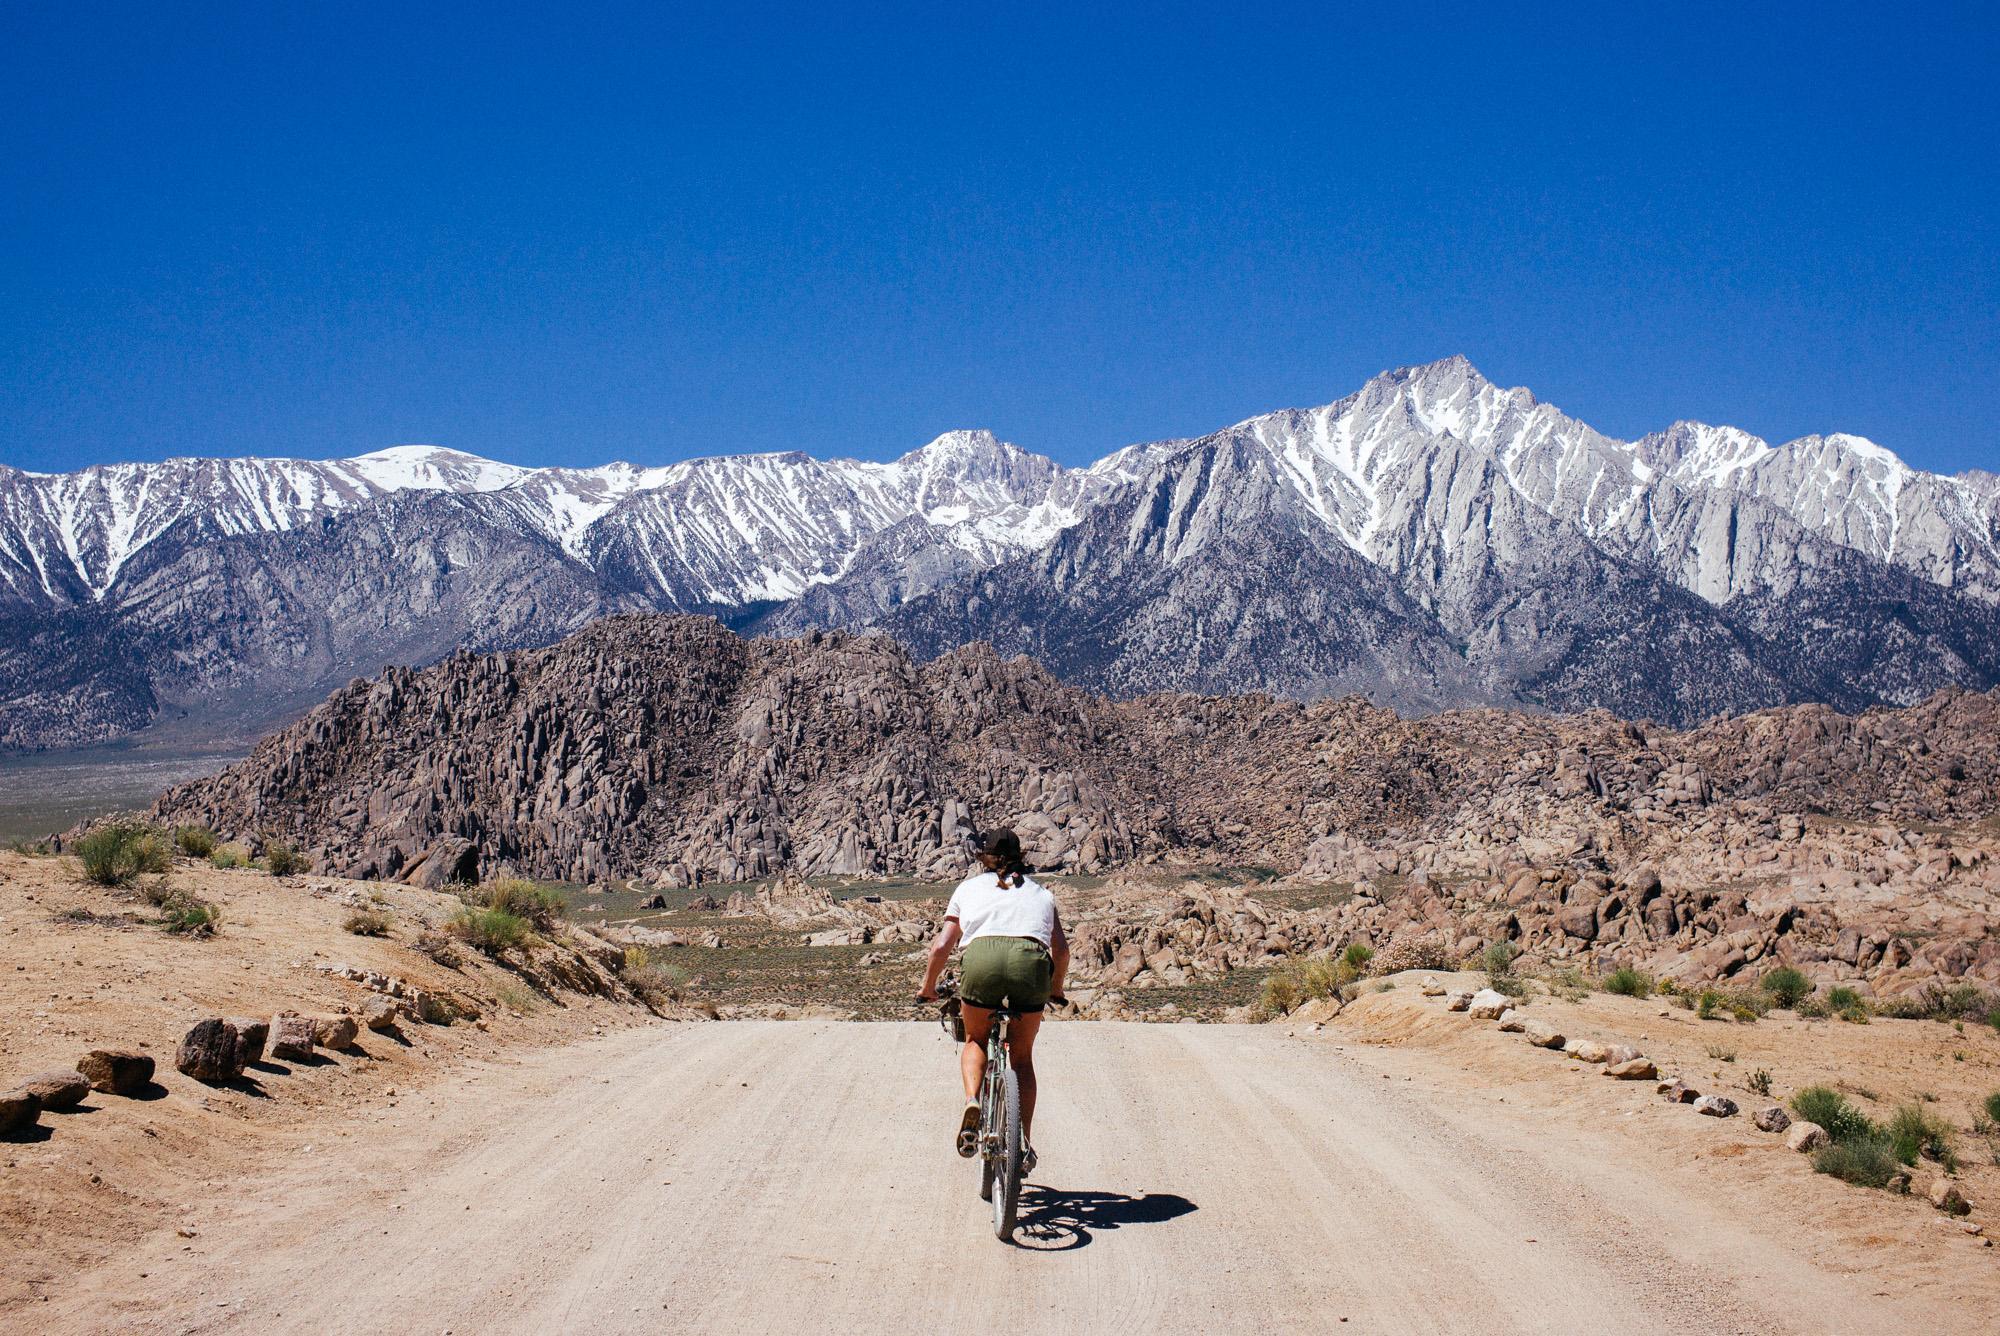 Taking off towards the Sierra